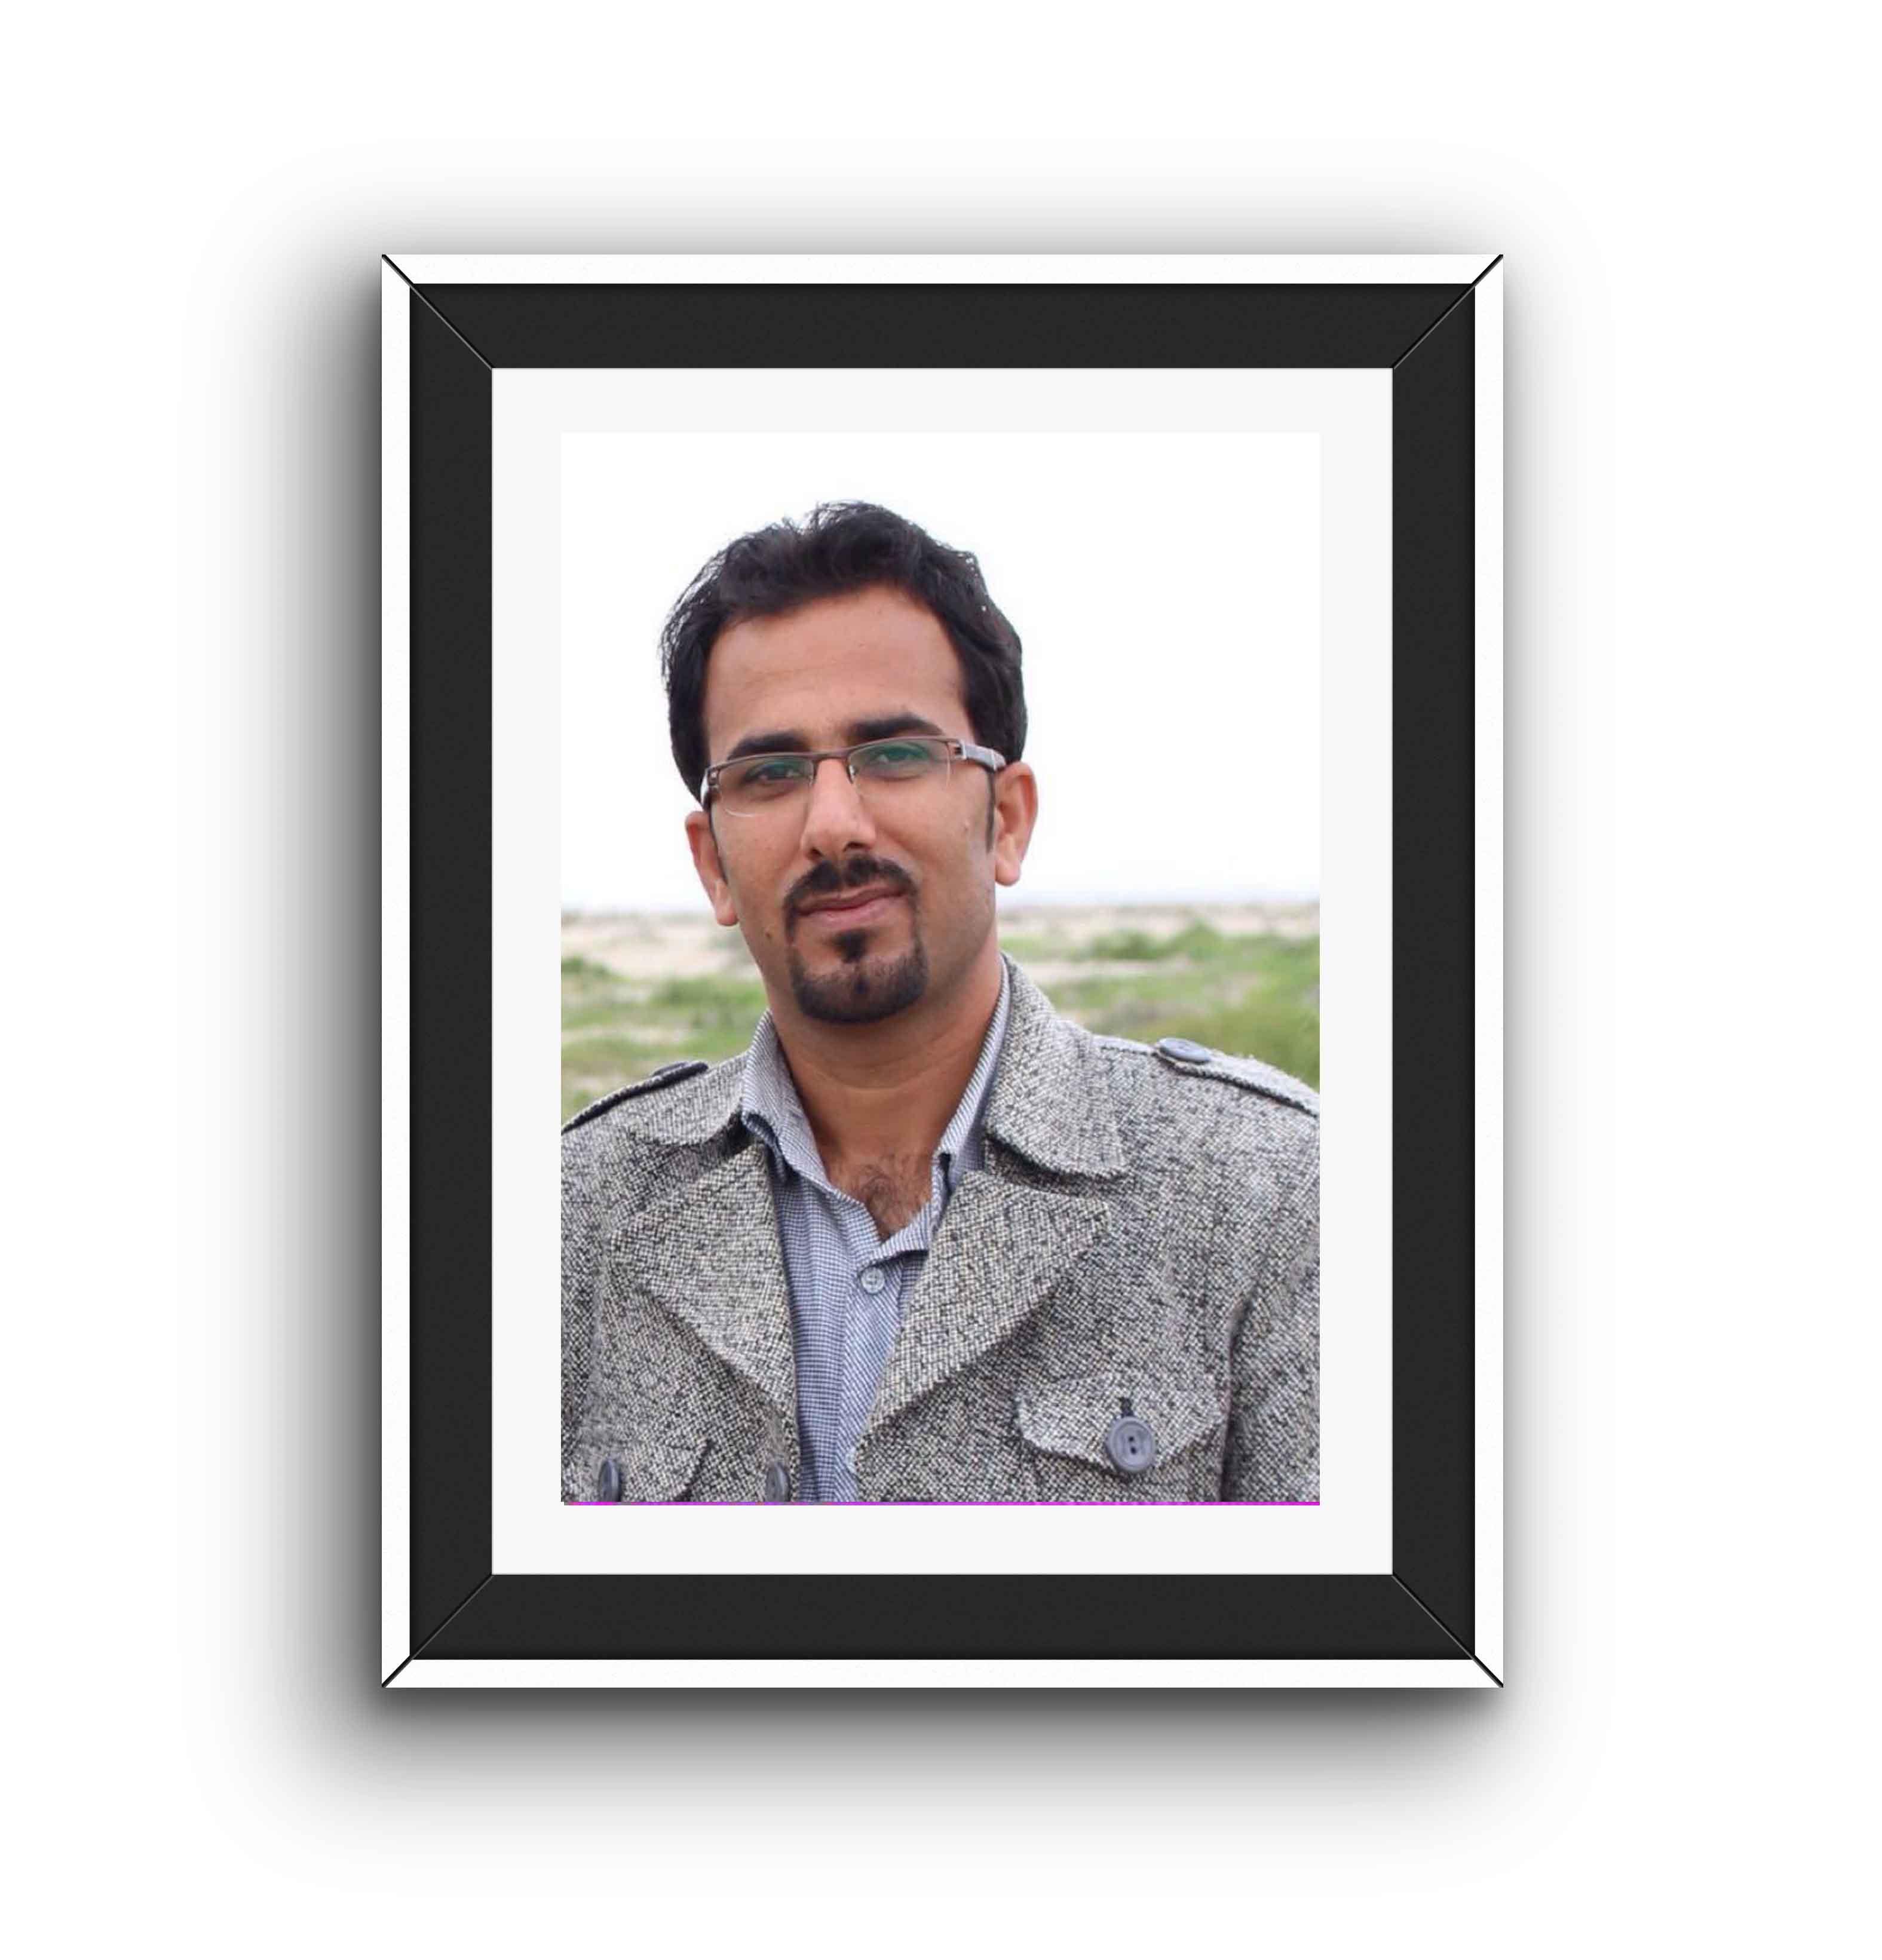 http://bayanbox.ir/view/7951341469321692121/ahmad-aali.jpg